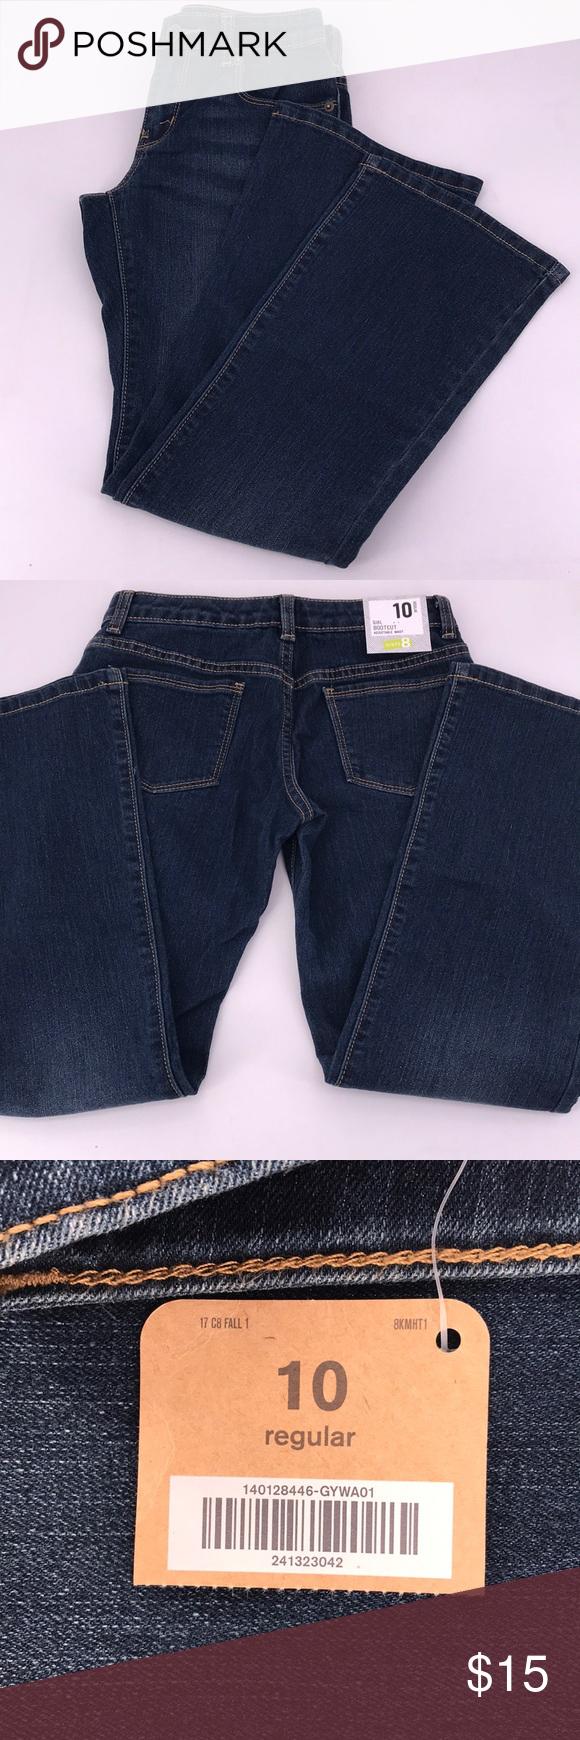 Size 8 Plus Crazy 8 Girls Denim Jeans Bootcut Adjustable Waist NWT